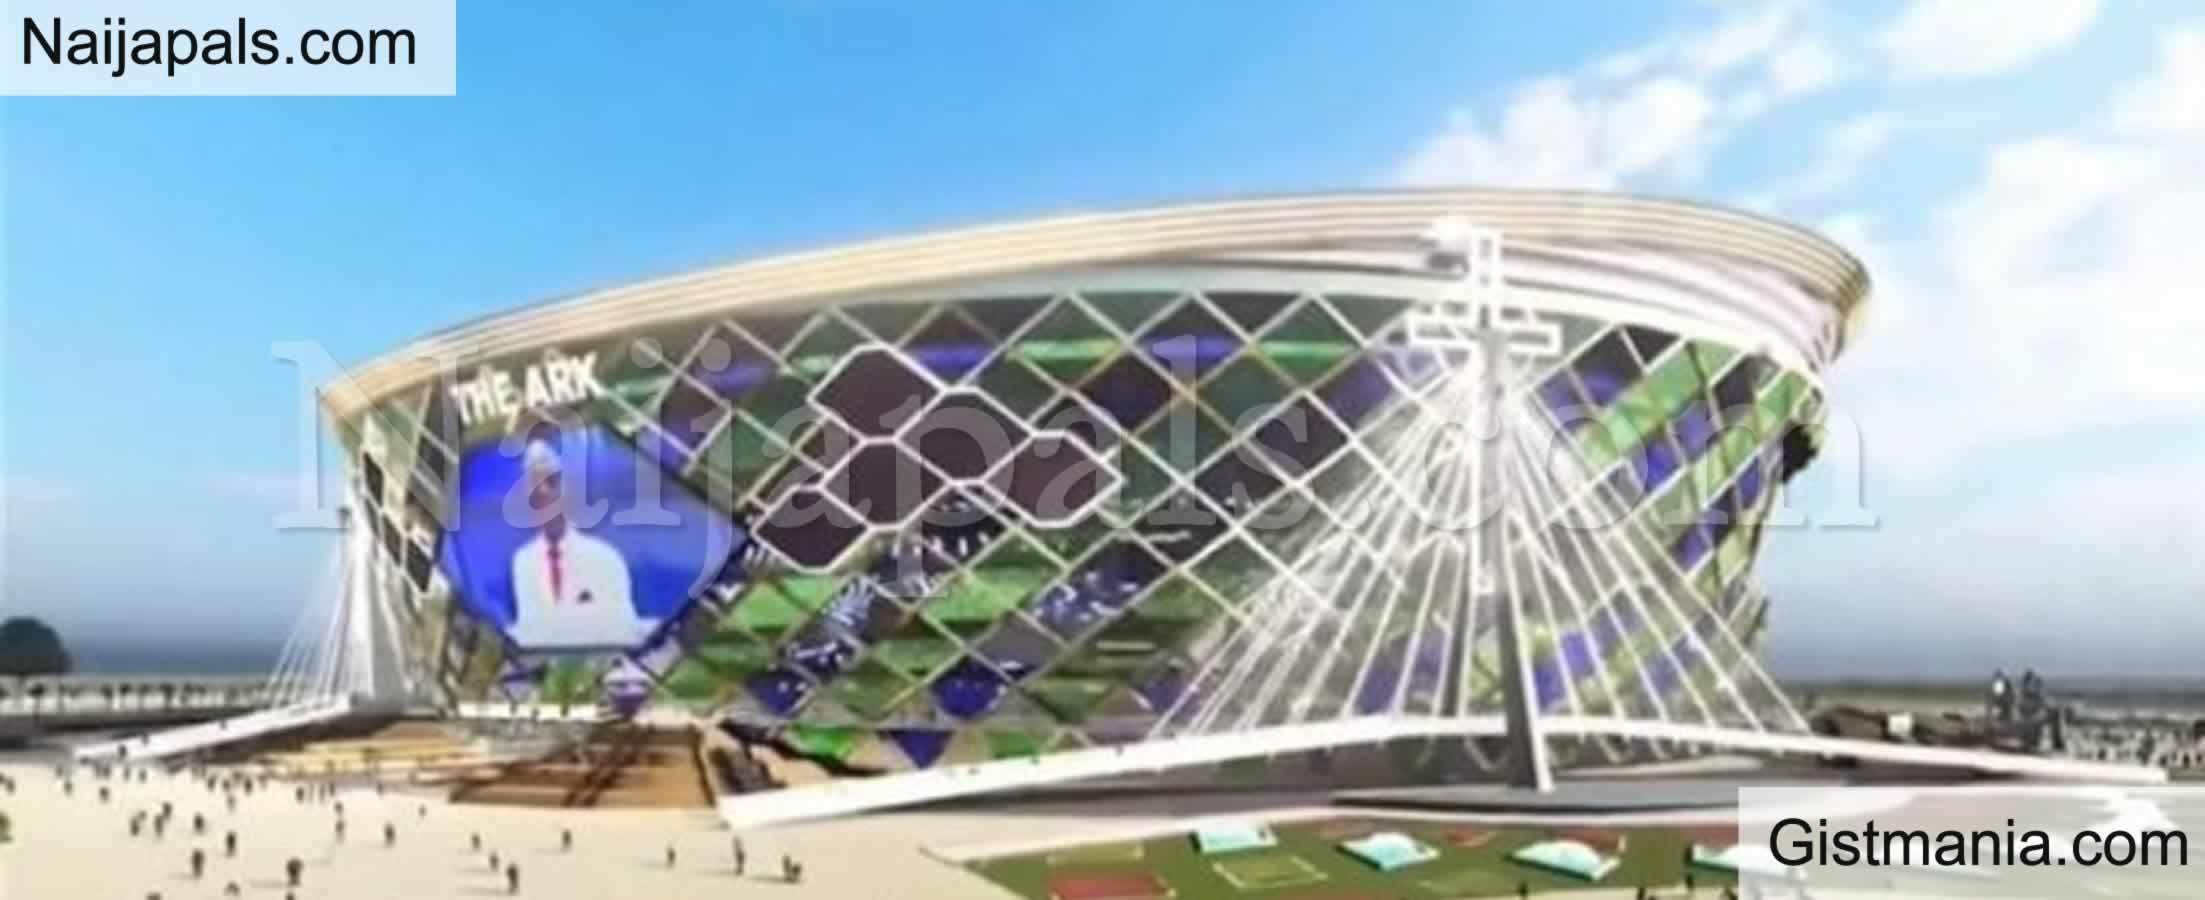 <img alt='.' class='lazyload' data-src='https://img.gistmania.com/emot/shocked.gif' /><b>Living Faith Church To Spend N160 Billion To Build 100,000-Seater Auditorium 'The Ark'</b>